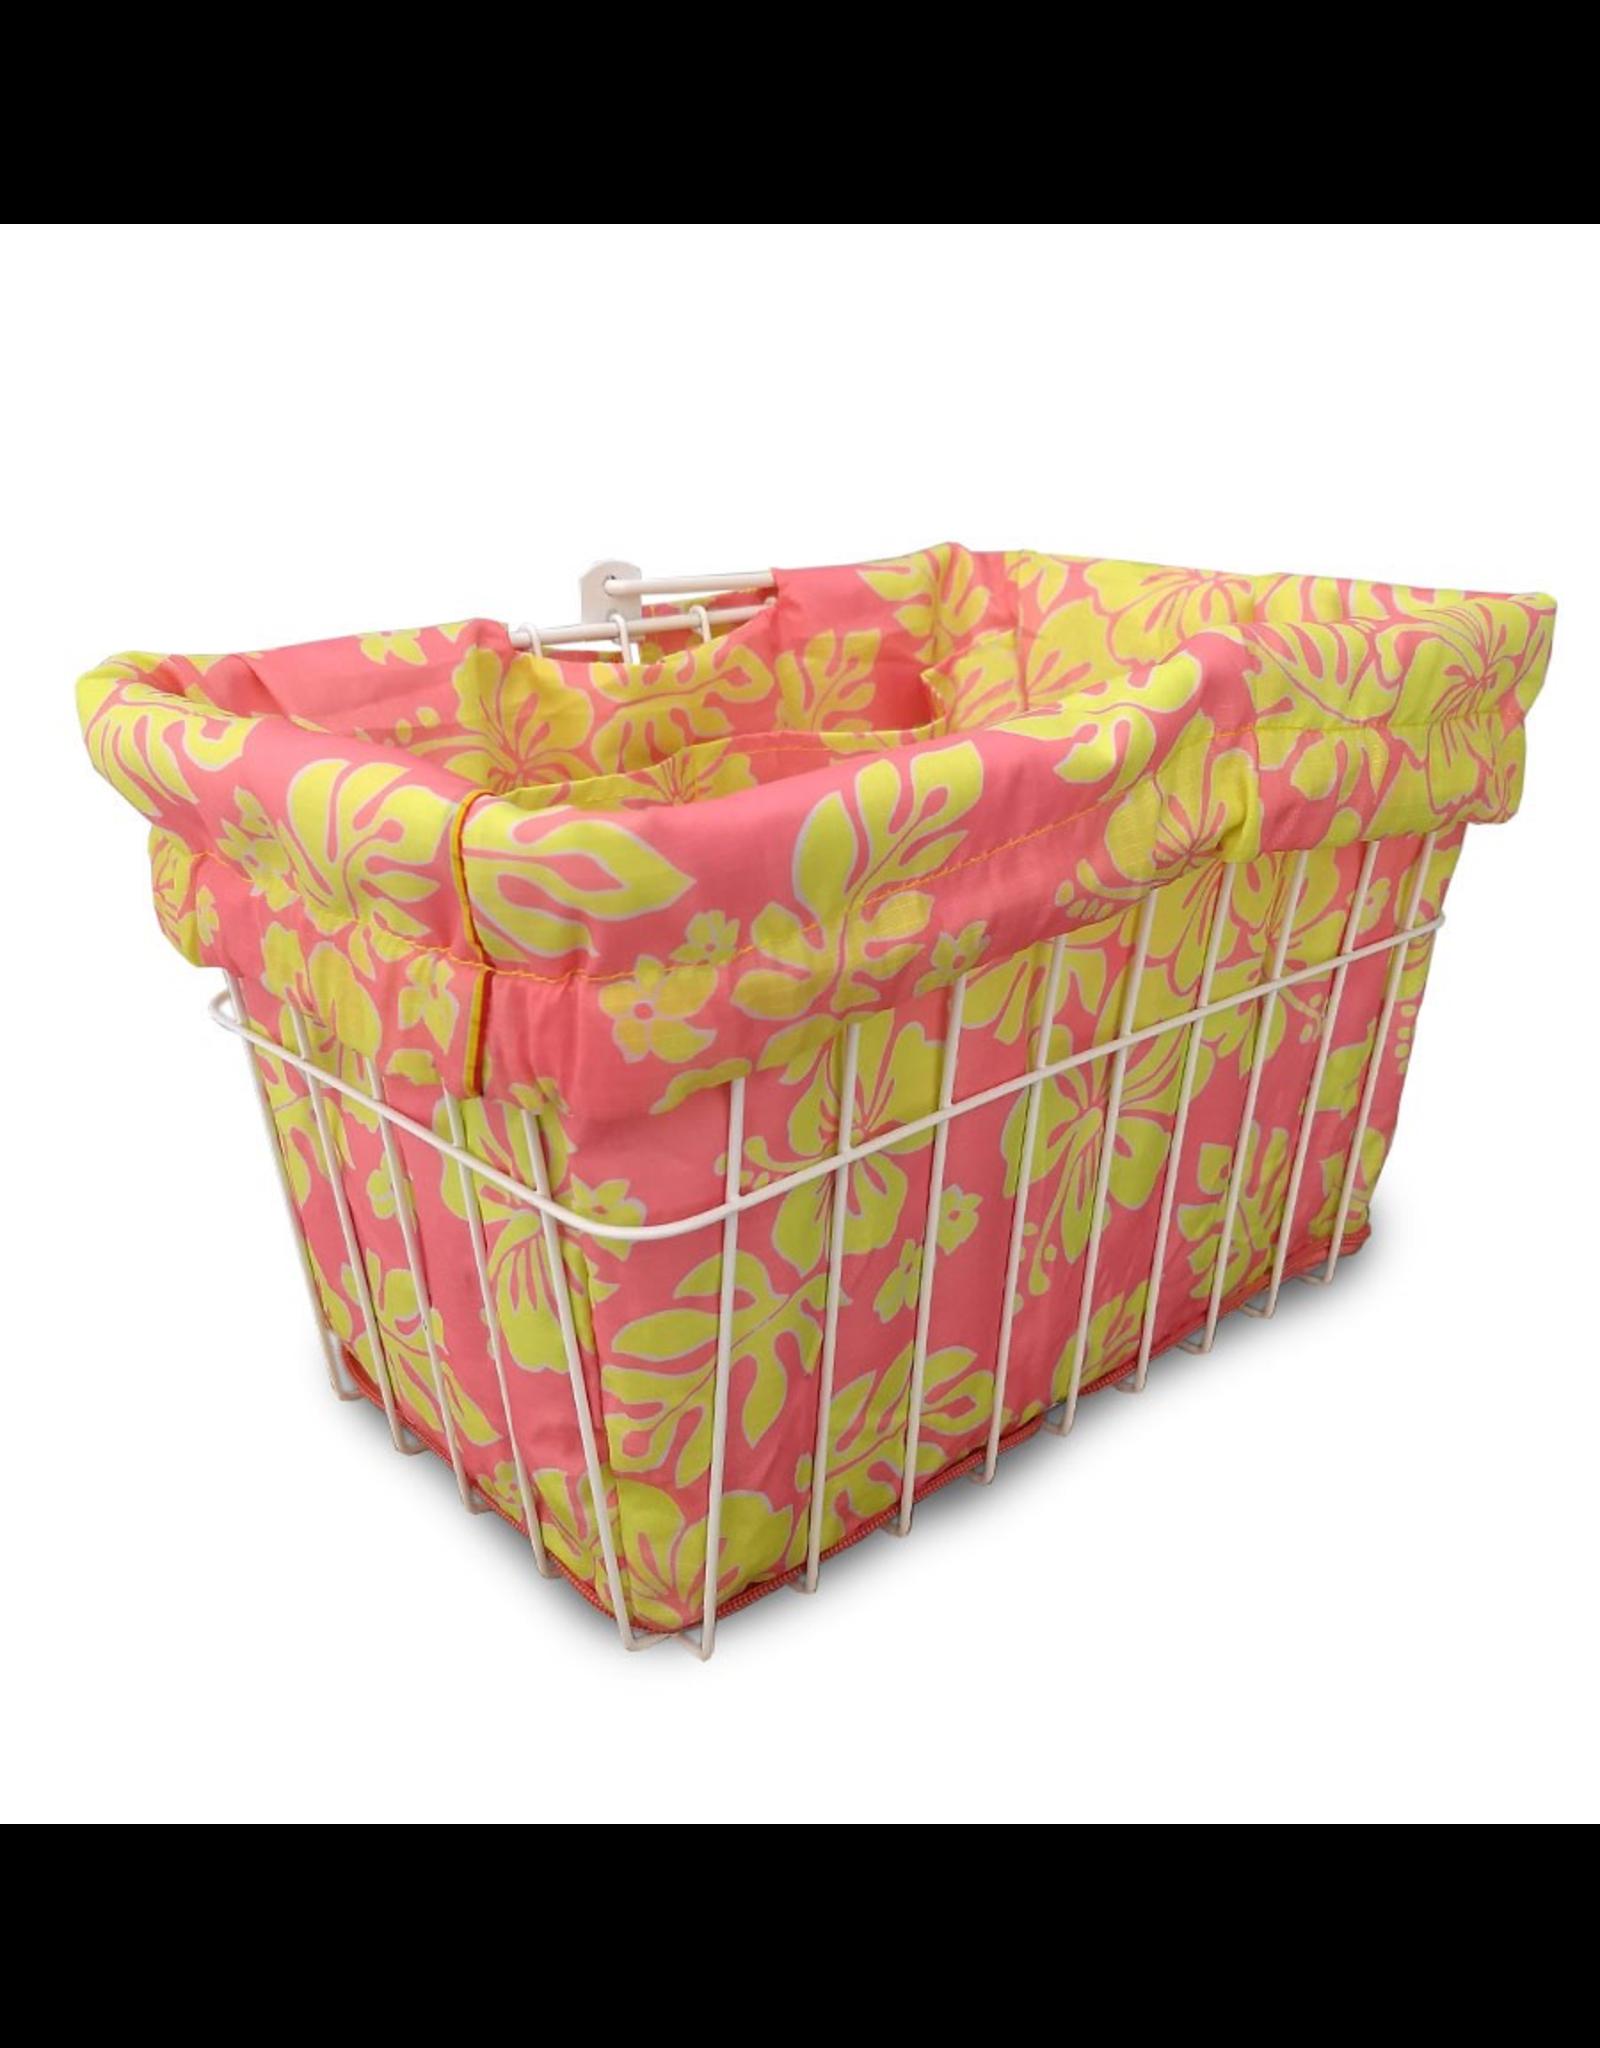 Cruiser Candy Cruiser Candy Basket Liner - Pink Lemonade Hibiscus